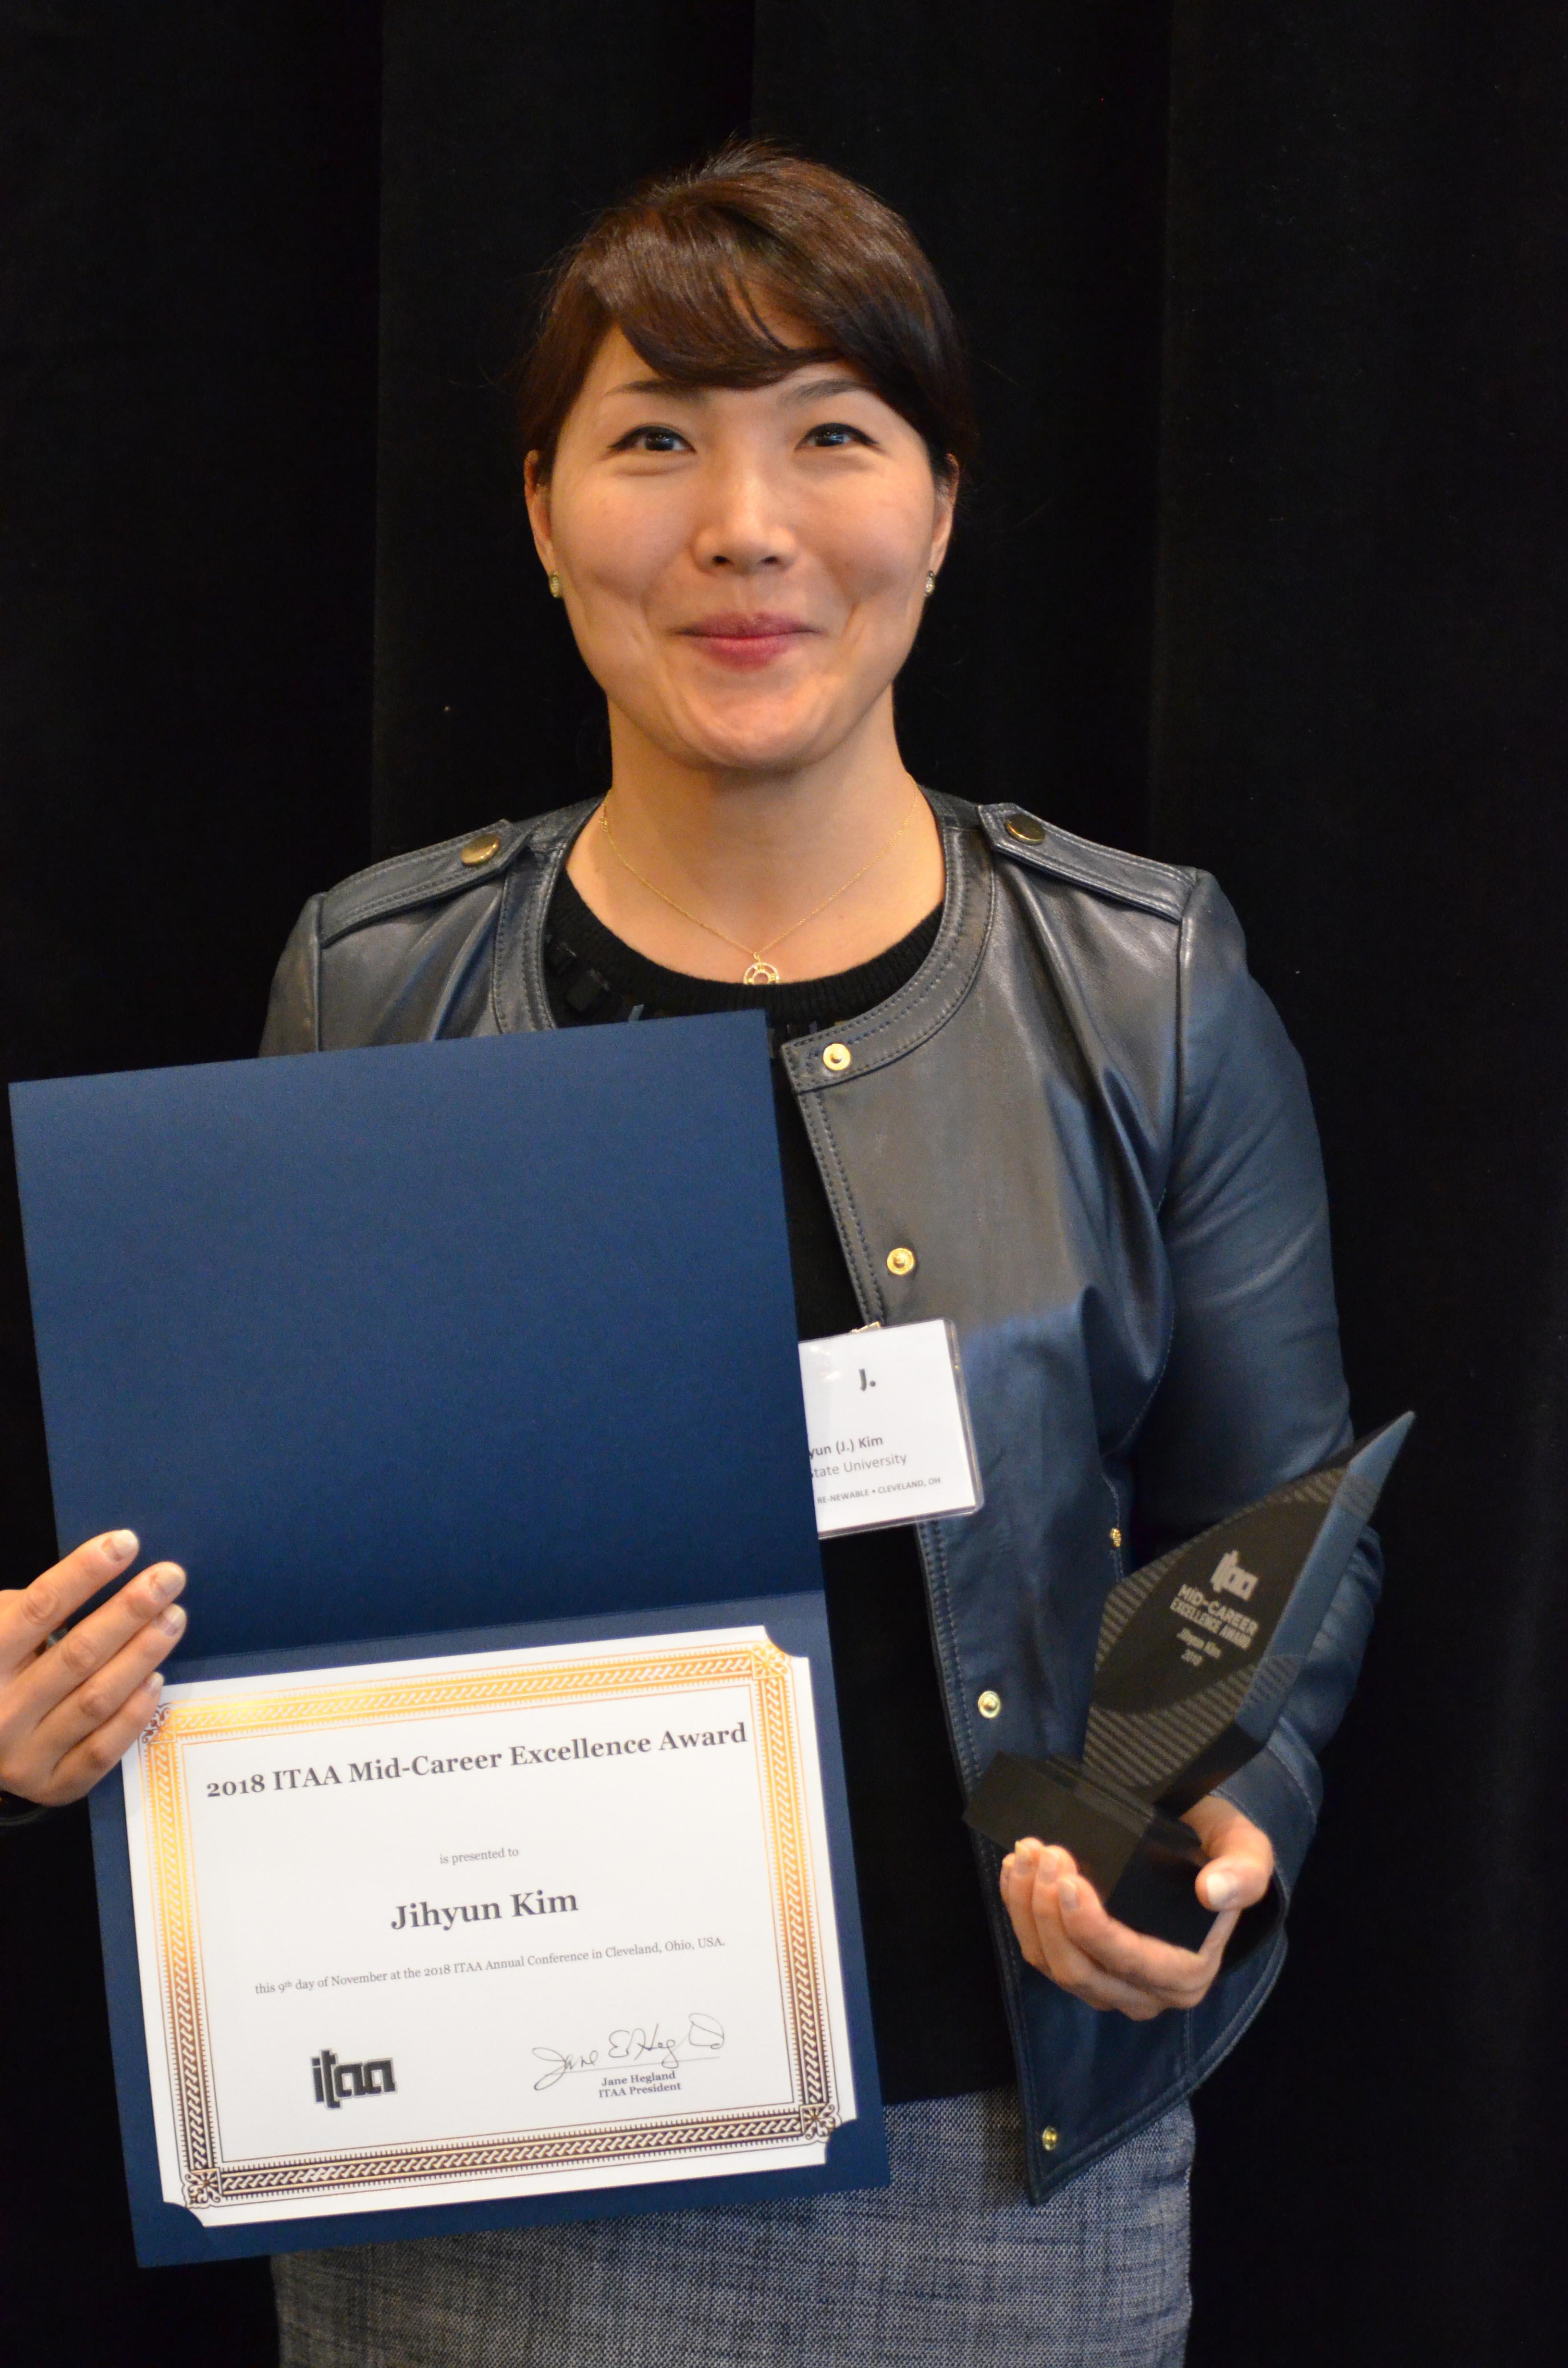 Dr. Jihyun Kim posing with award at the 2018 ITAA Awards in Cleveland.